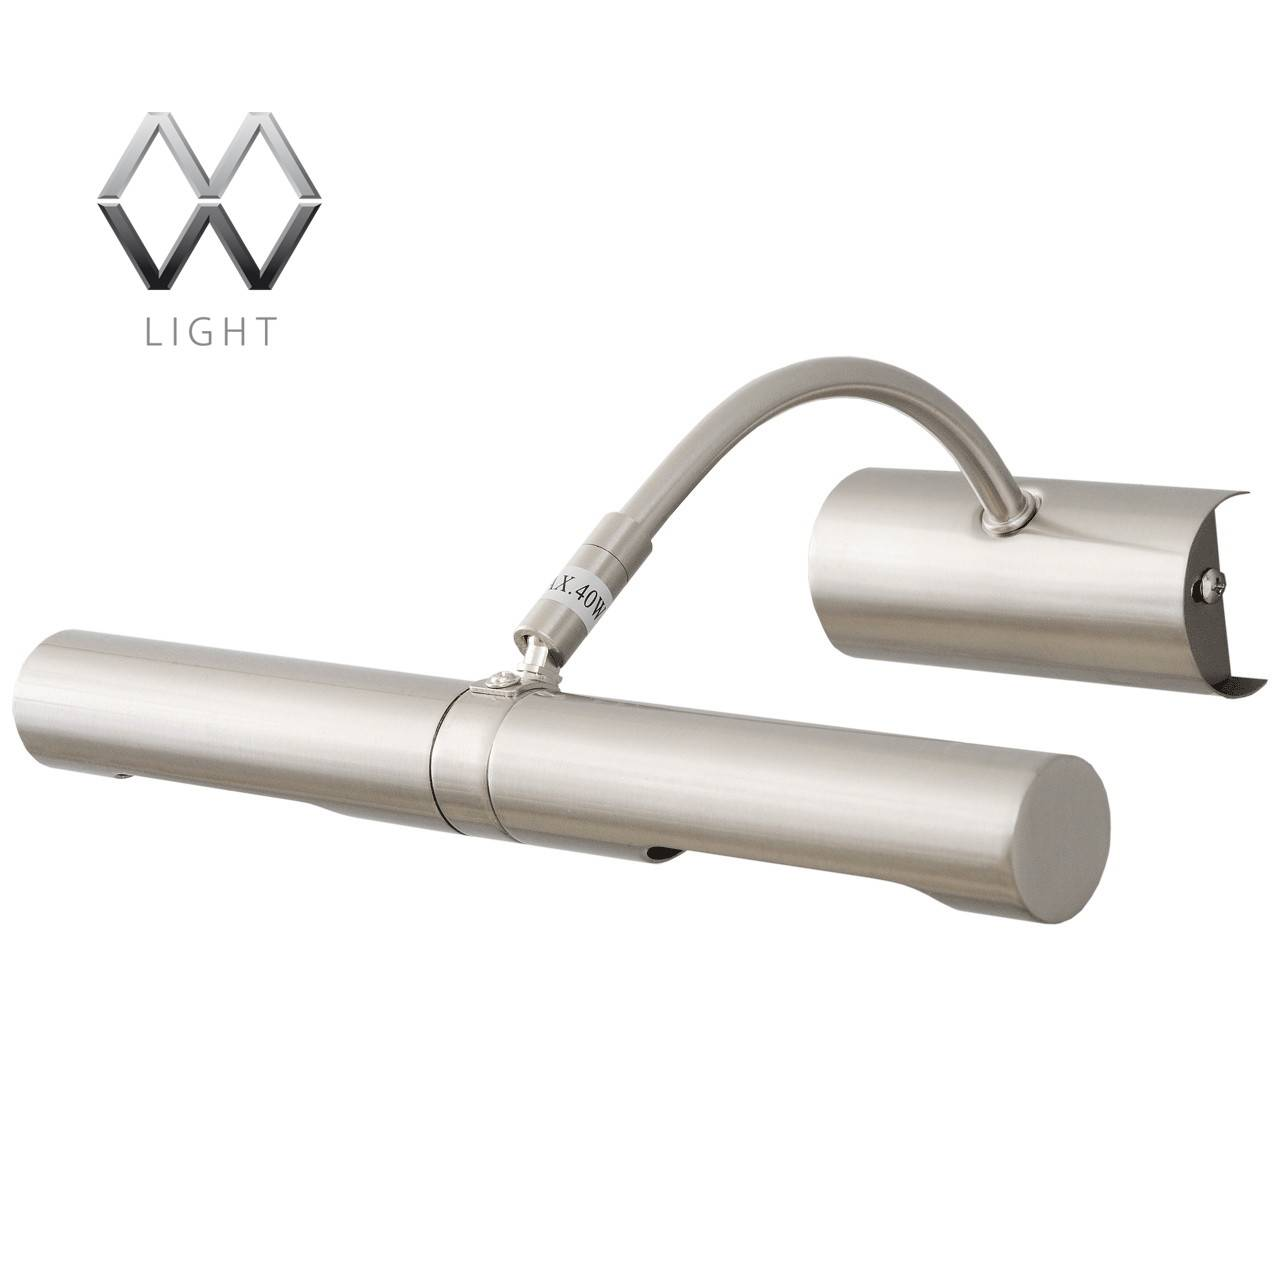 Подсветка для картин MW-Light Вернисаж Спот 2 502020702 спот mw light 808040201